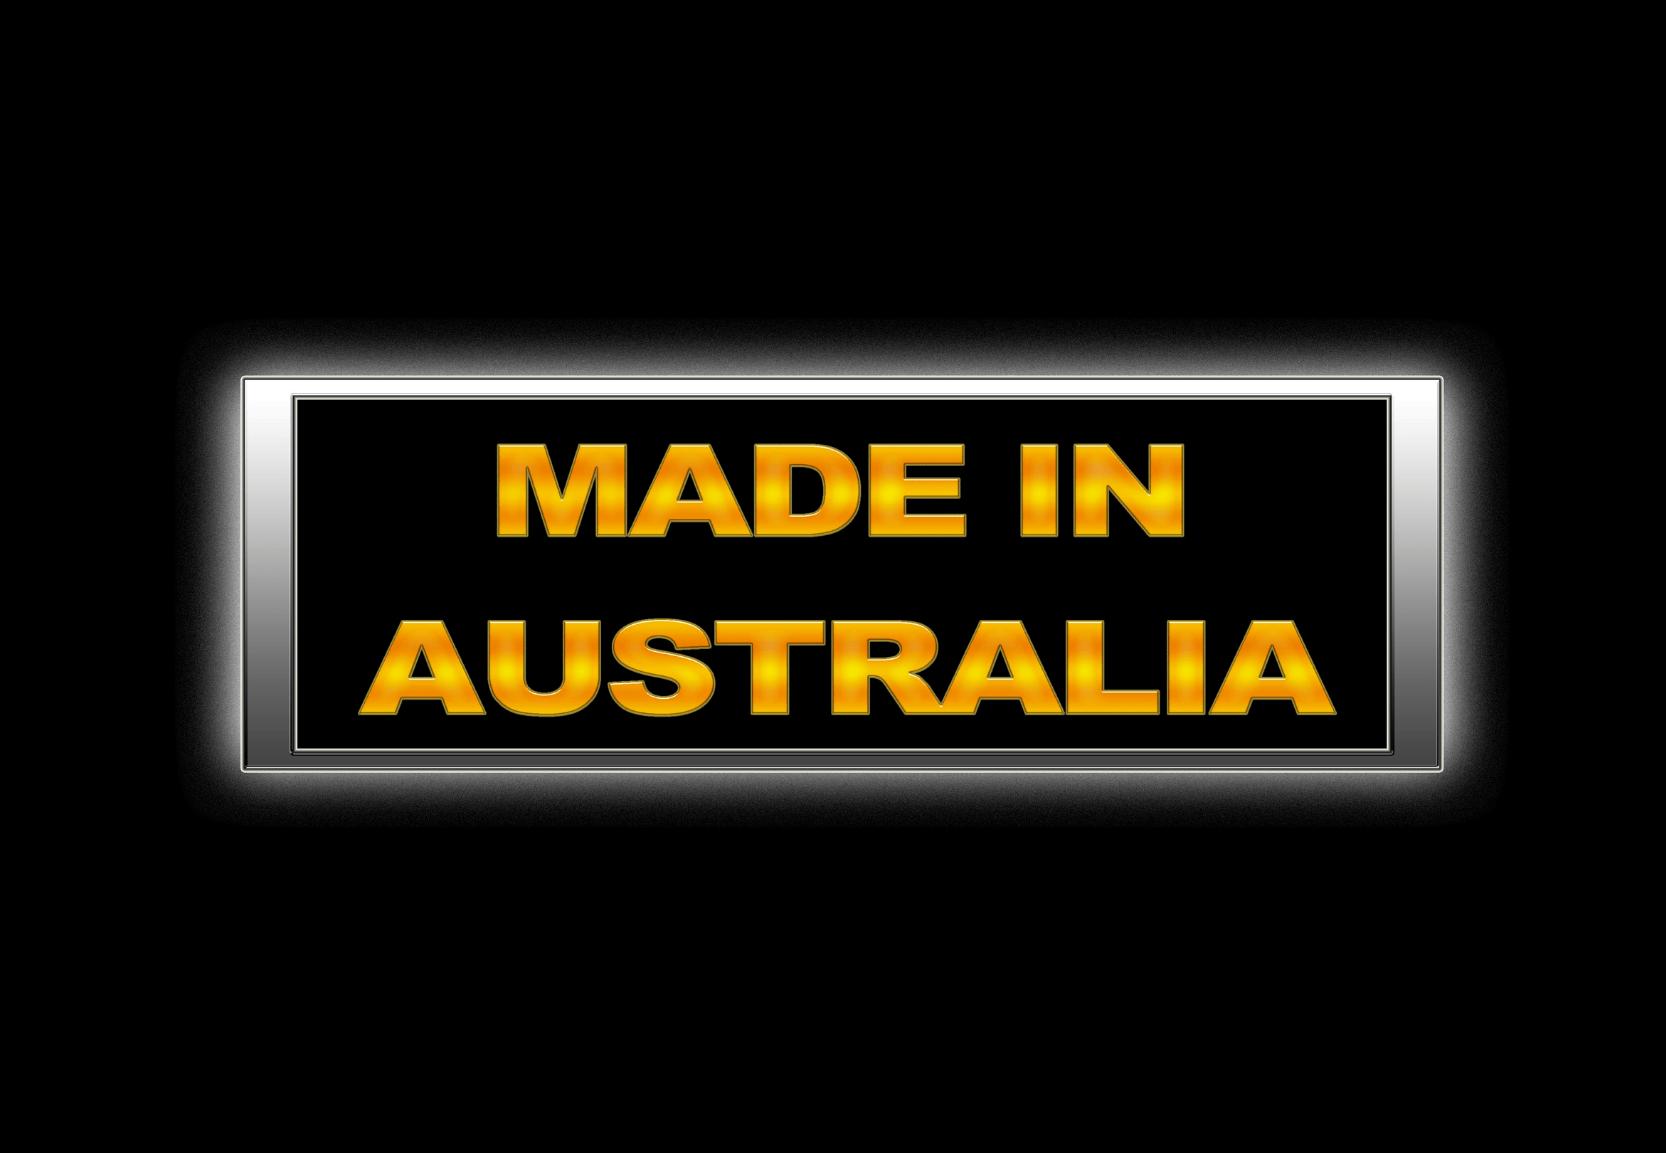 Australian Based Wastewater Manufacturer